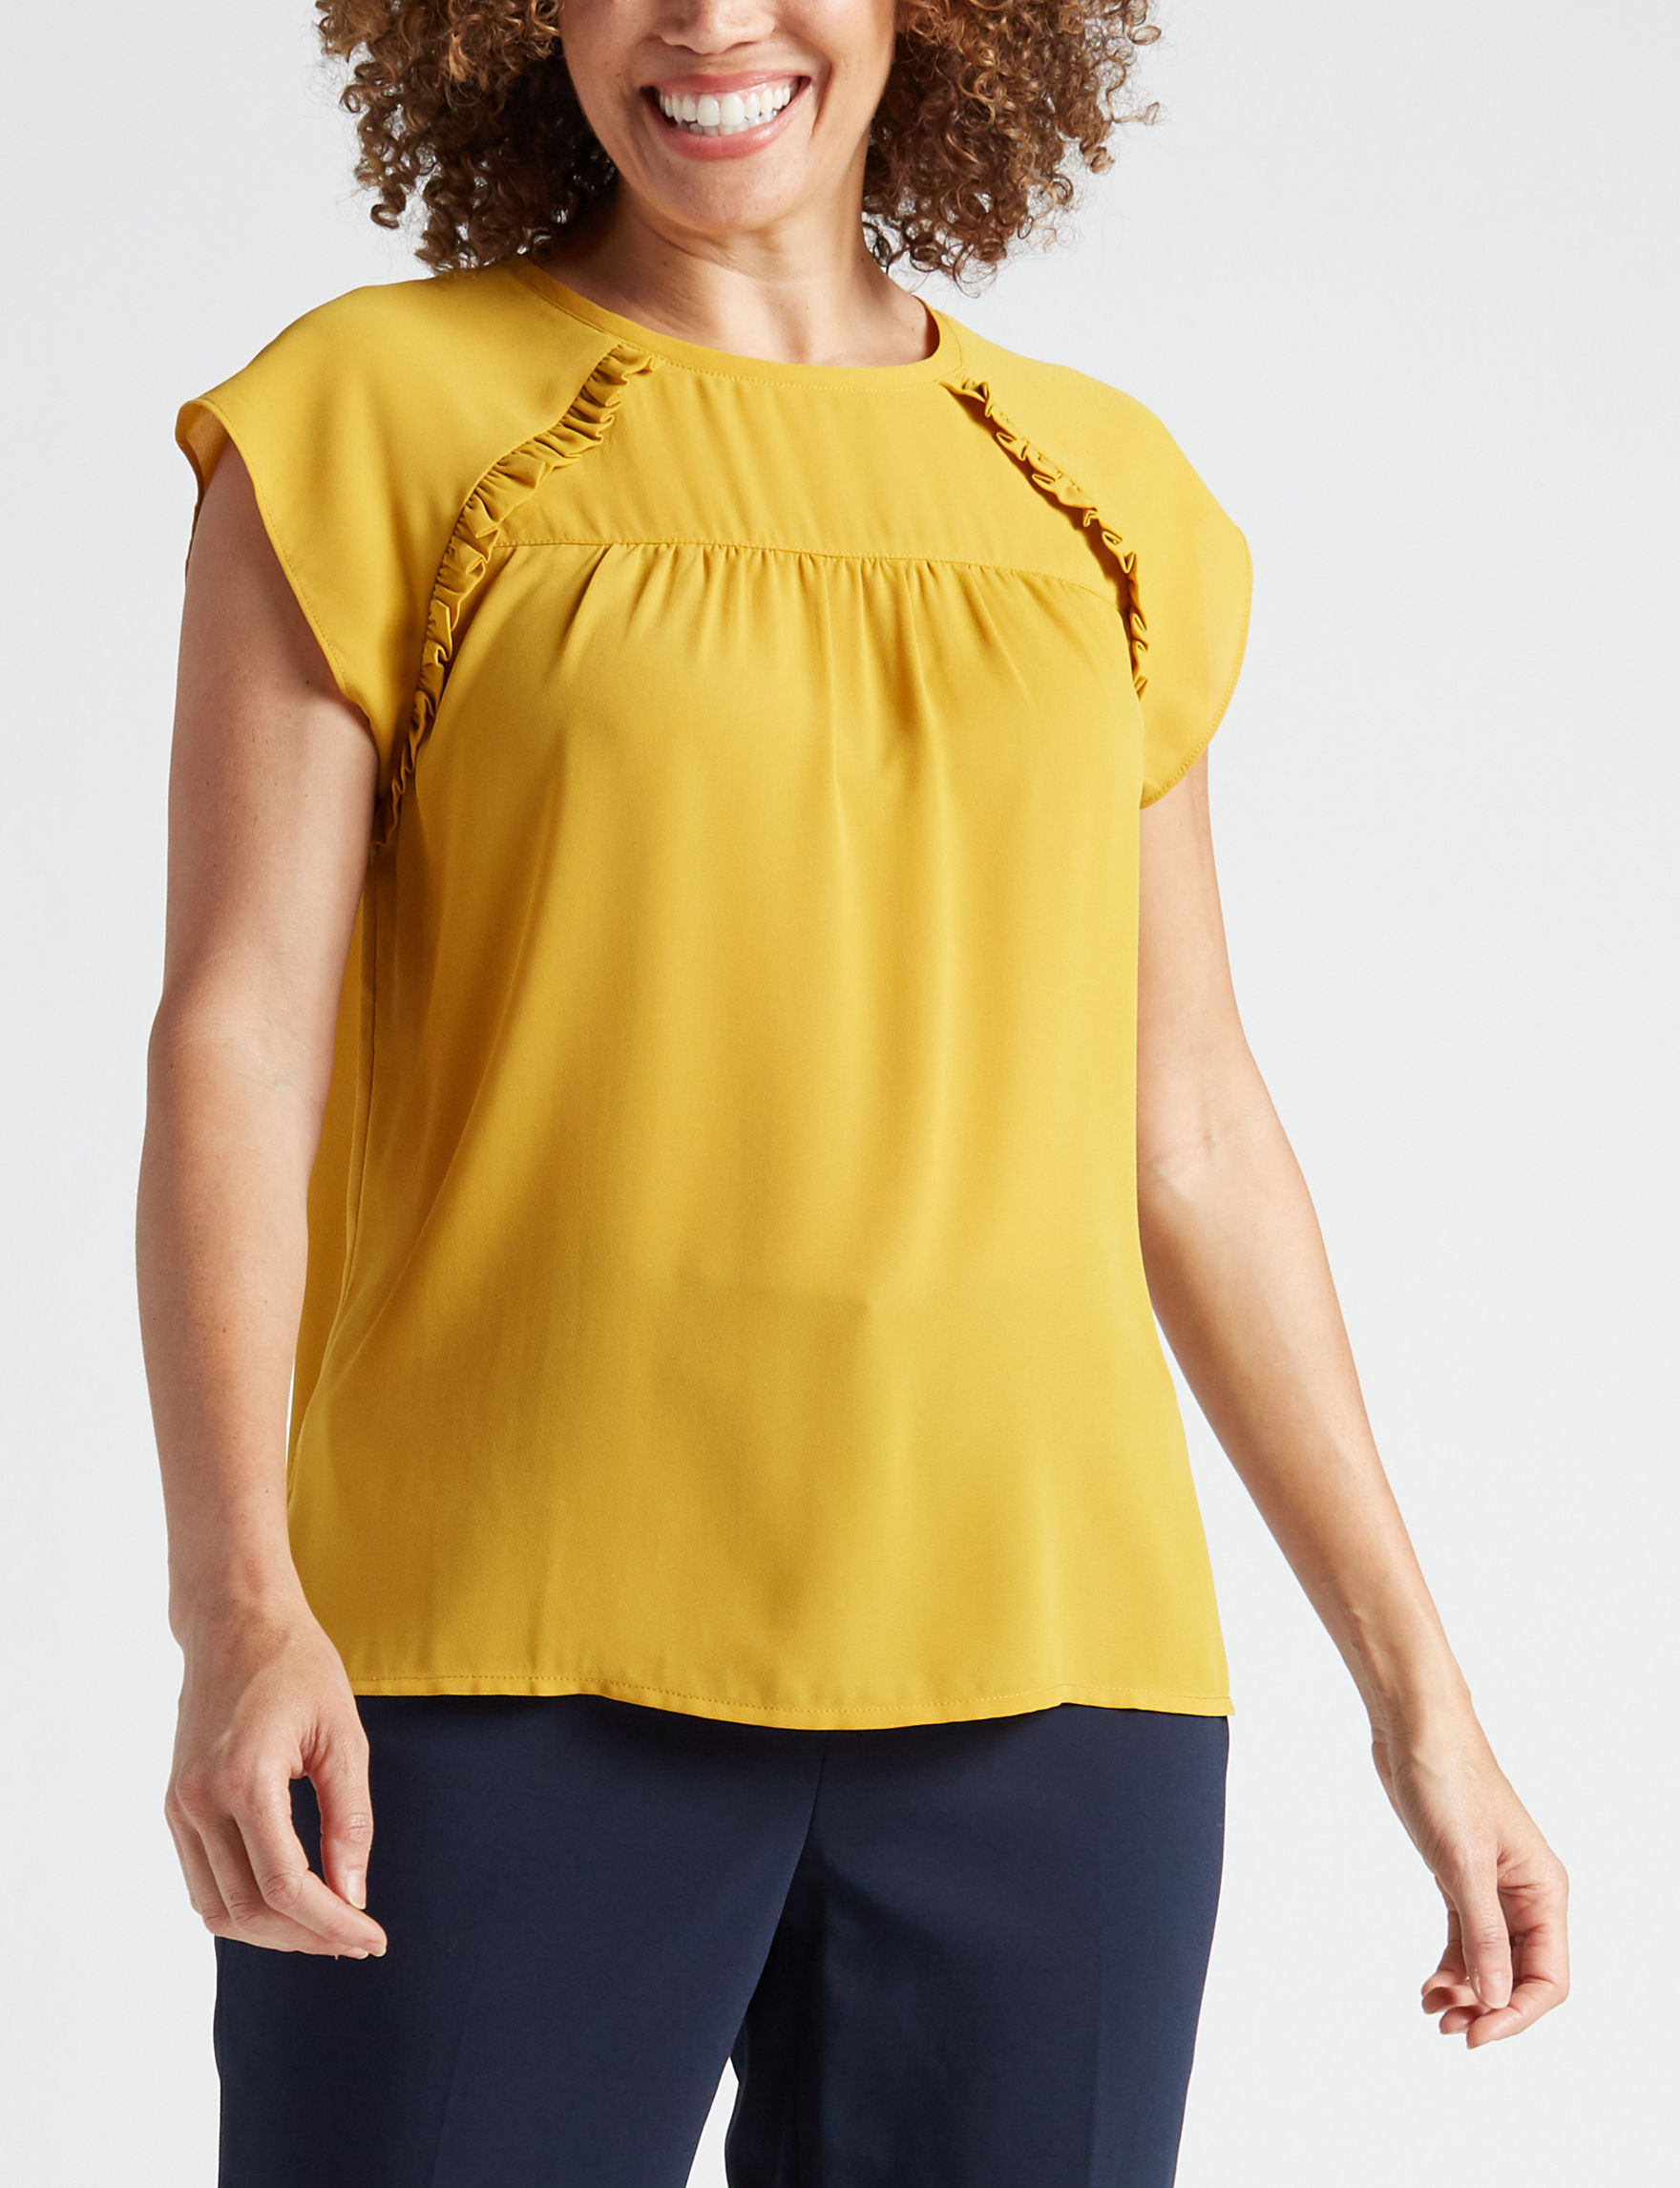 Zac & Rachel Gold Shirts & Blouses